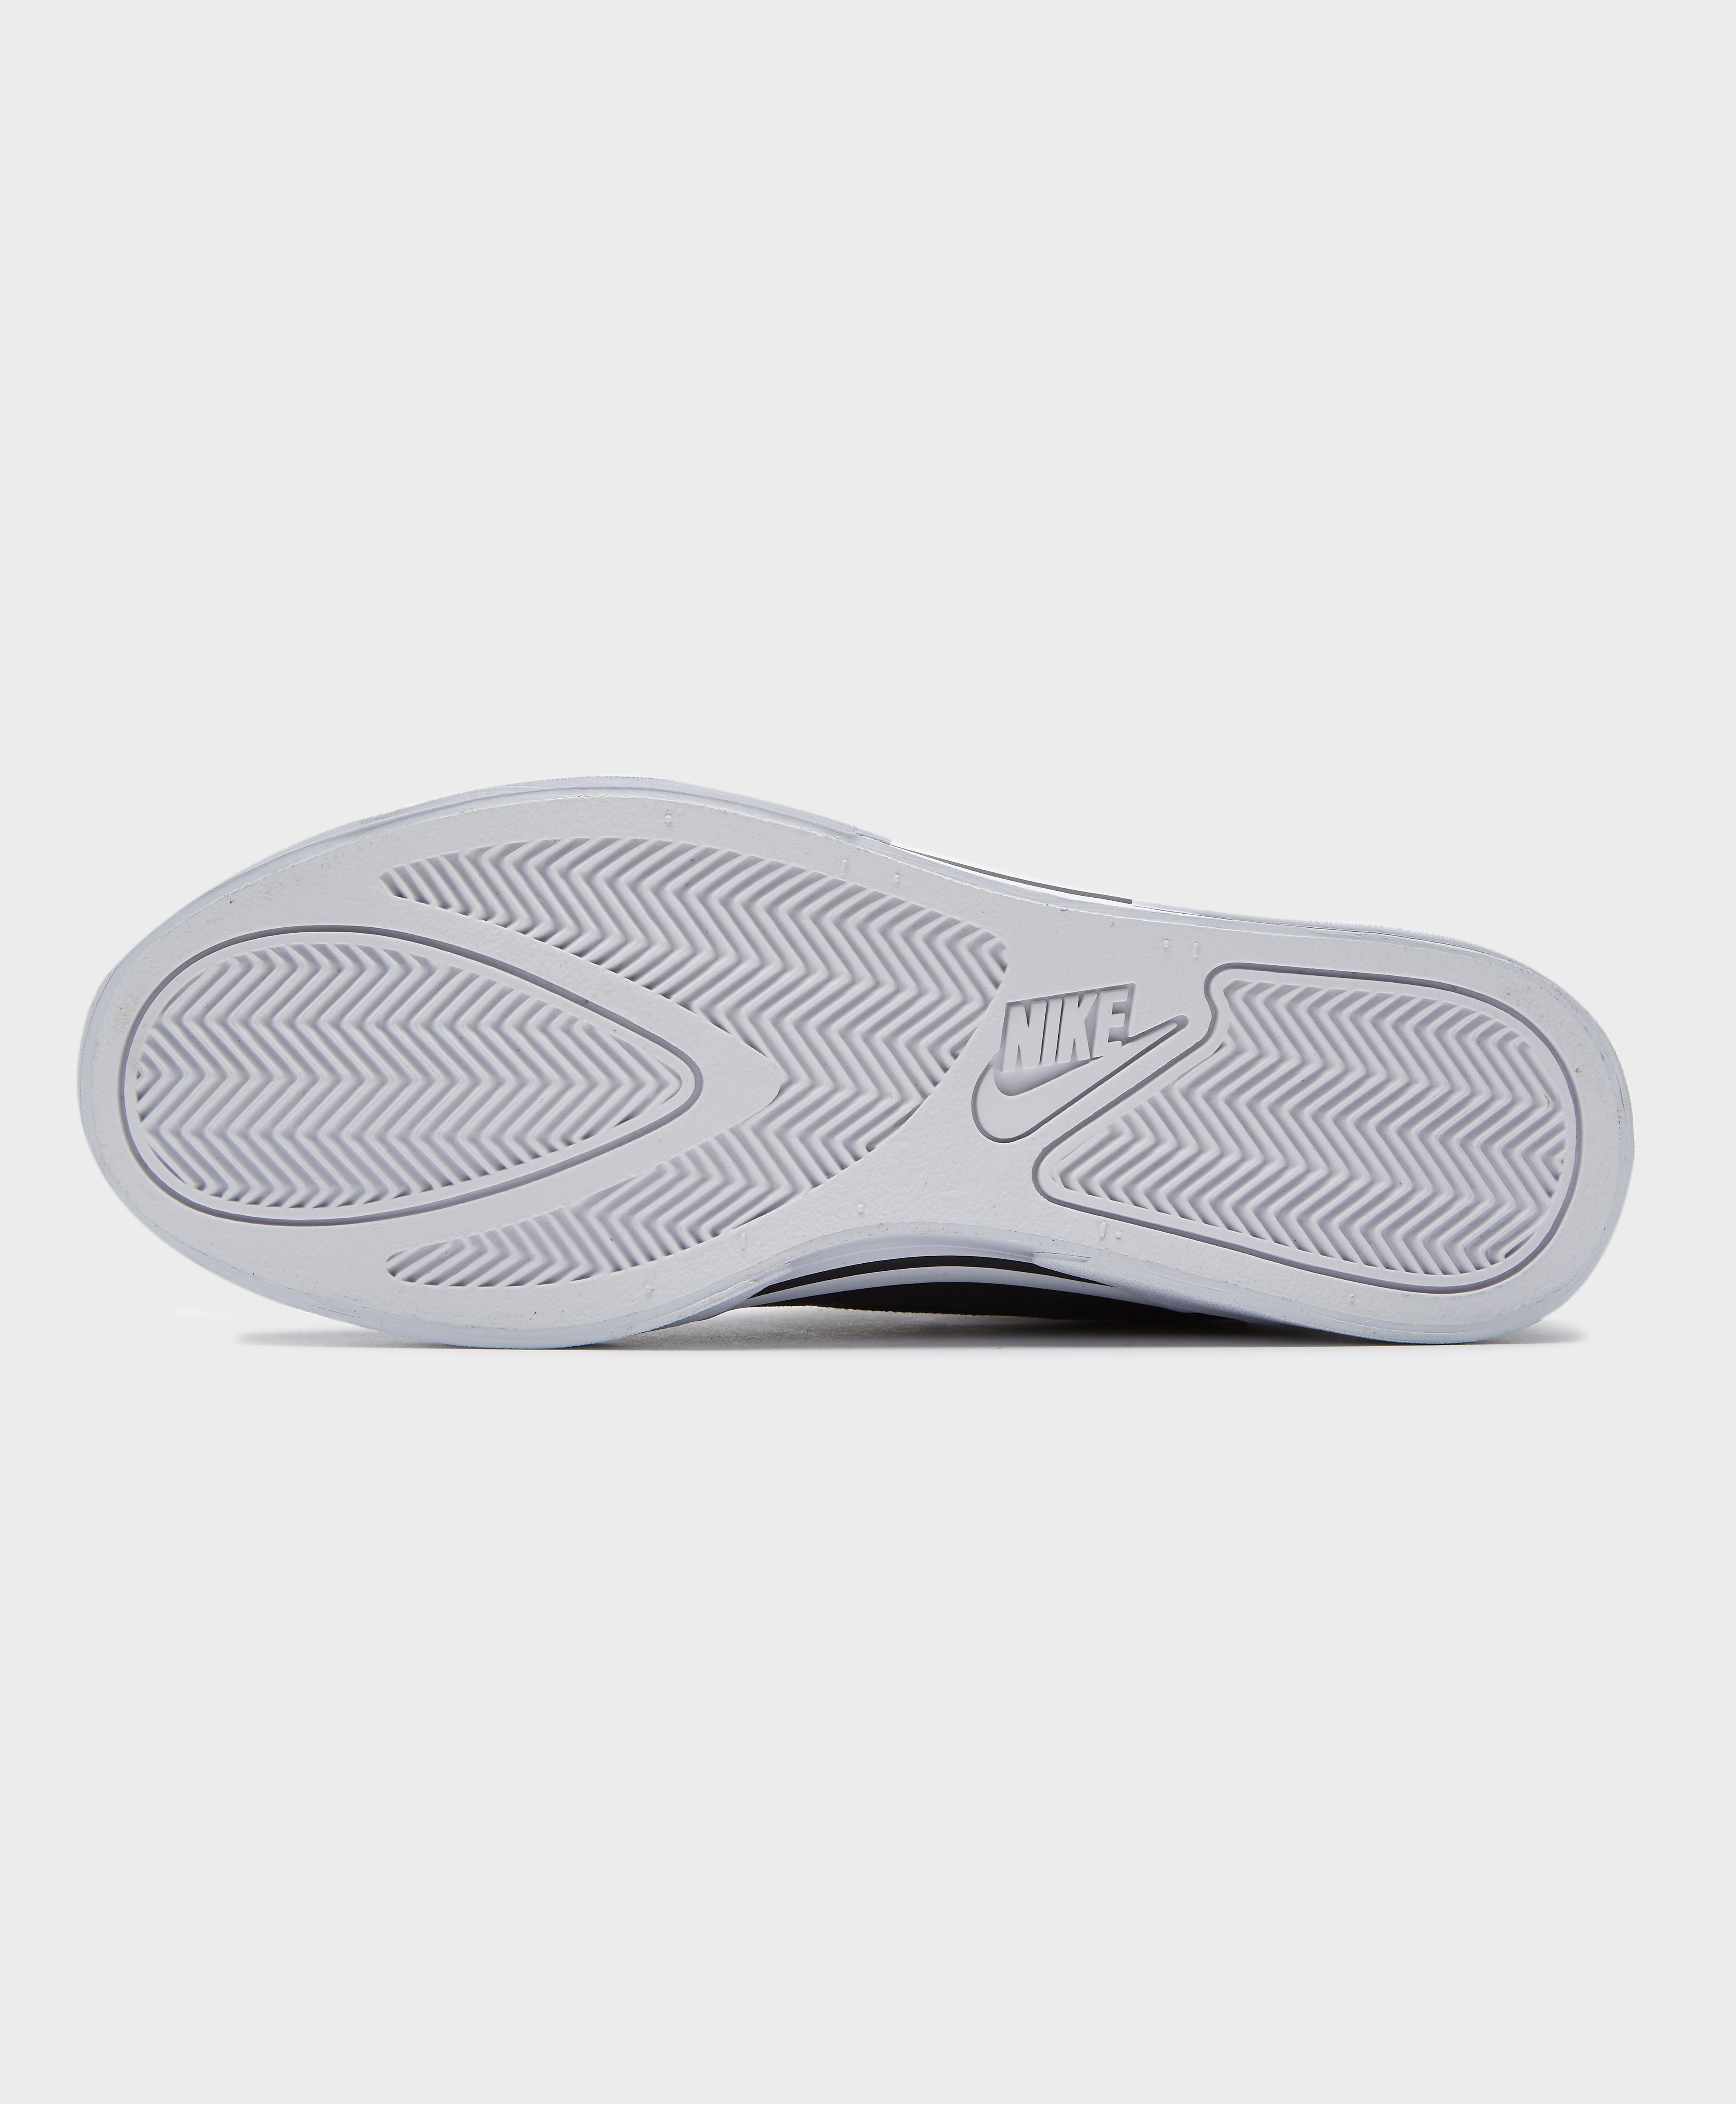 Nike GTS '16 Textile